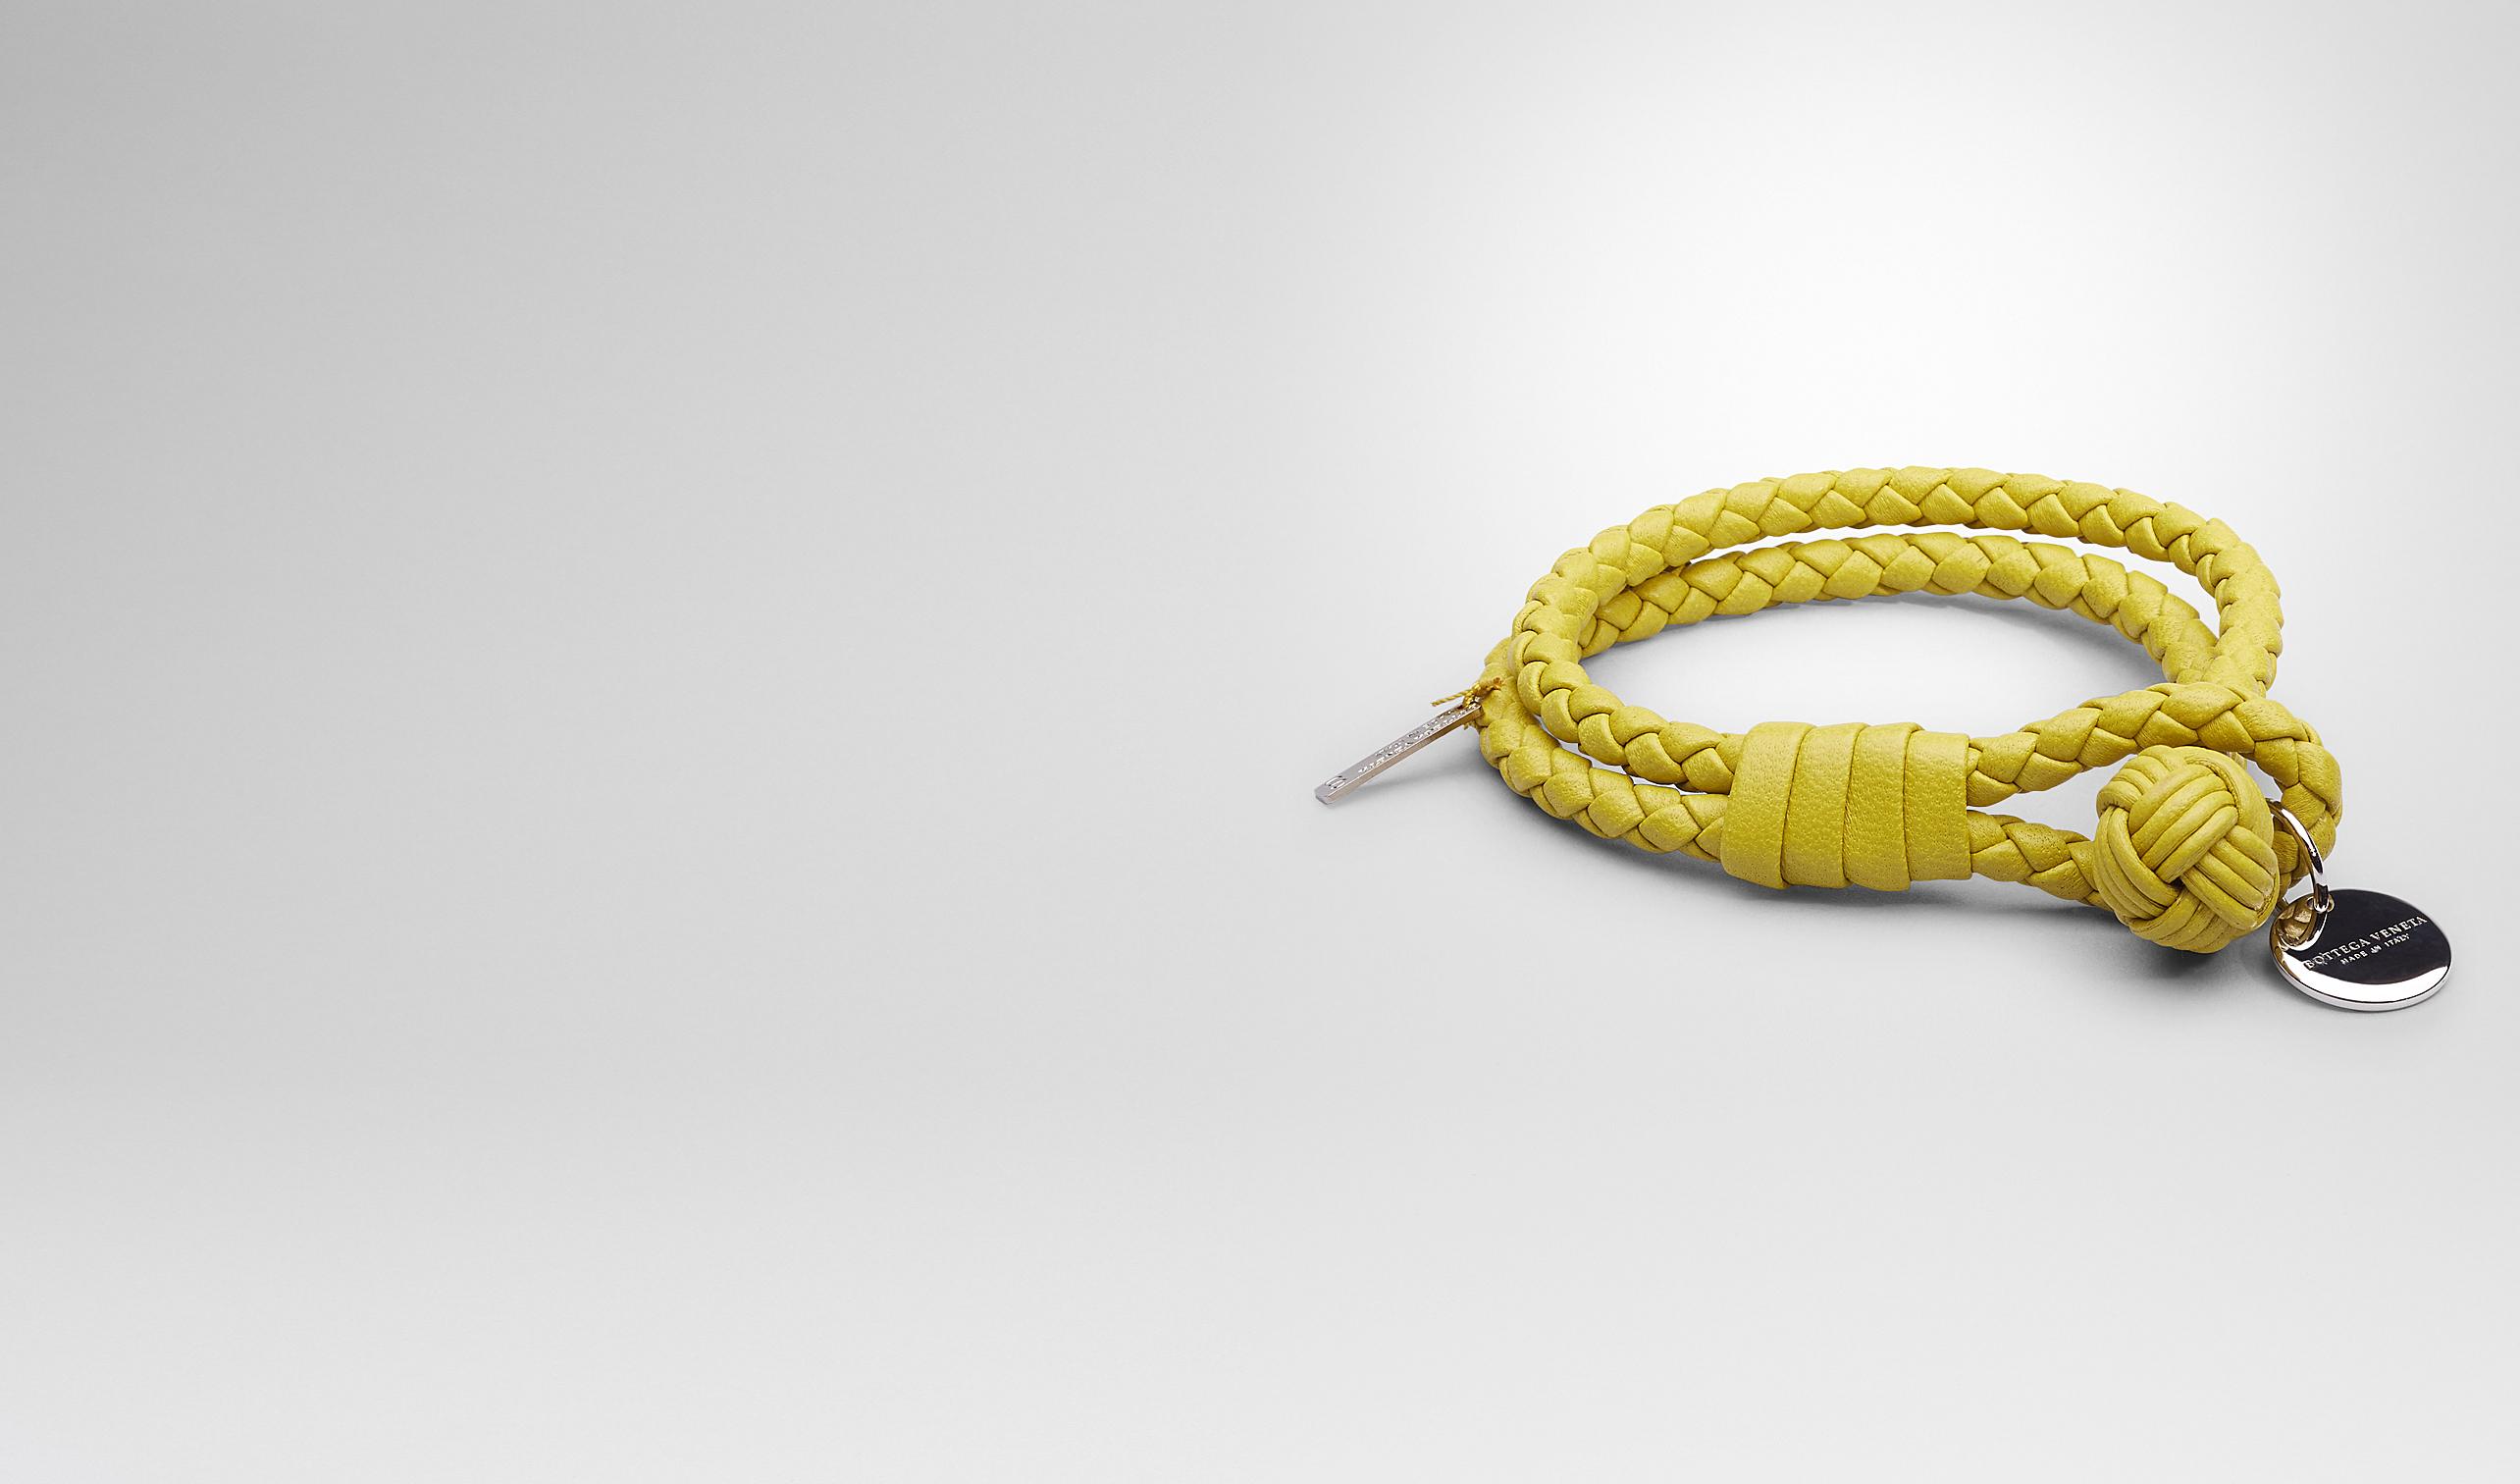 BOTTEGA VENETA Keyring or Bracelets E NEW CHARTREUSE INTRECCIATO NAPPA BRACELET pl